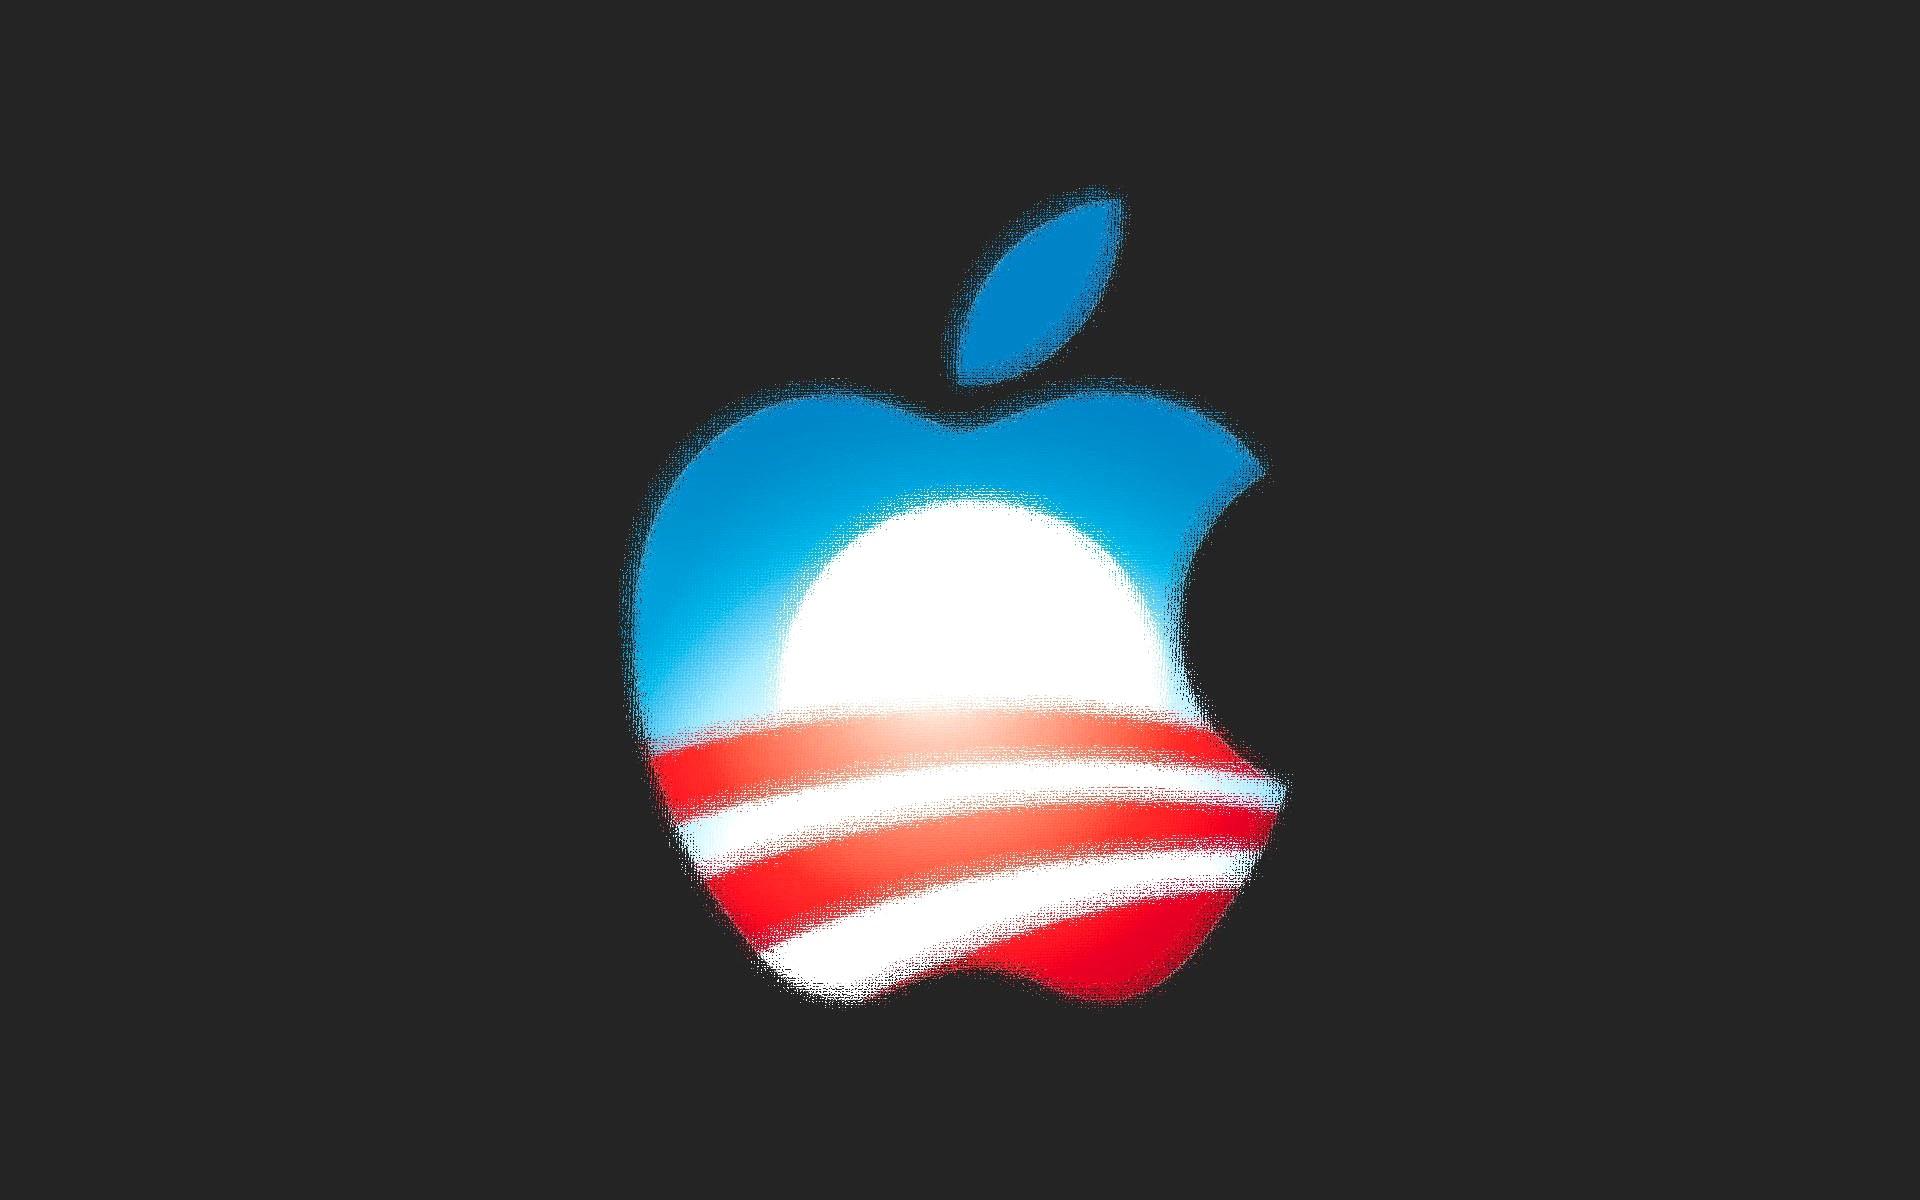 Wallpaper apple colorful logo pixel 1920x1200 hd - Original apple logo wallpaper ...